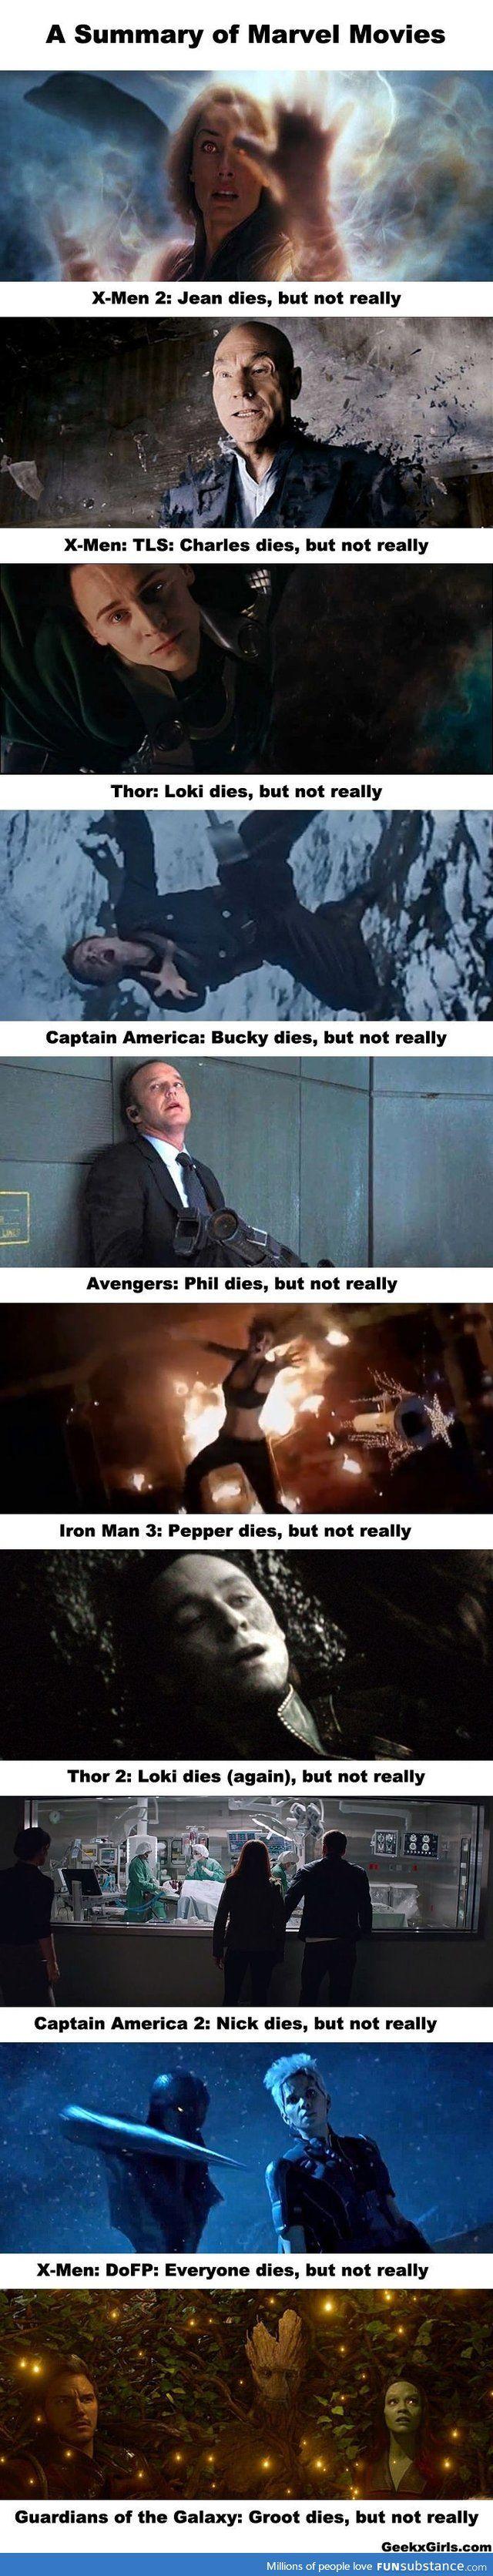 In Marvel movies, people die, but not really